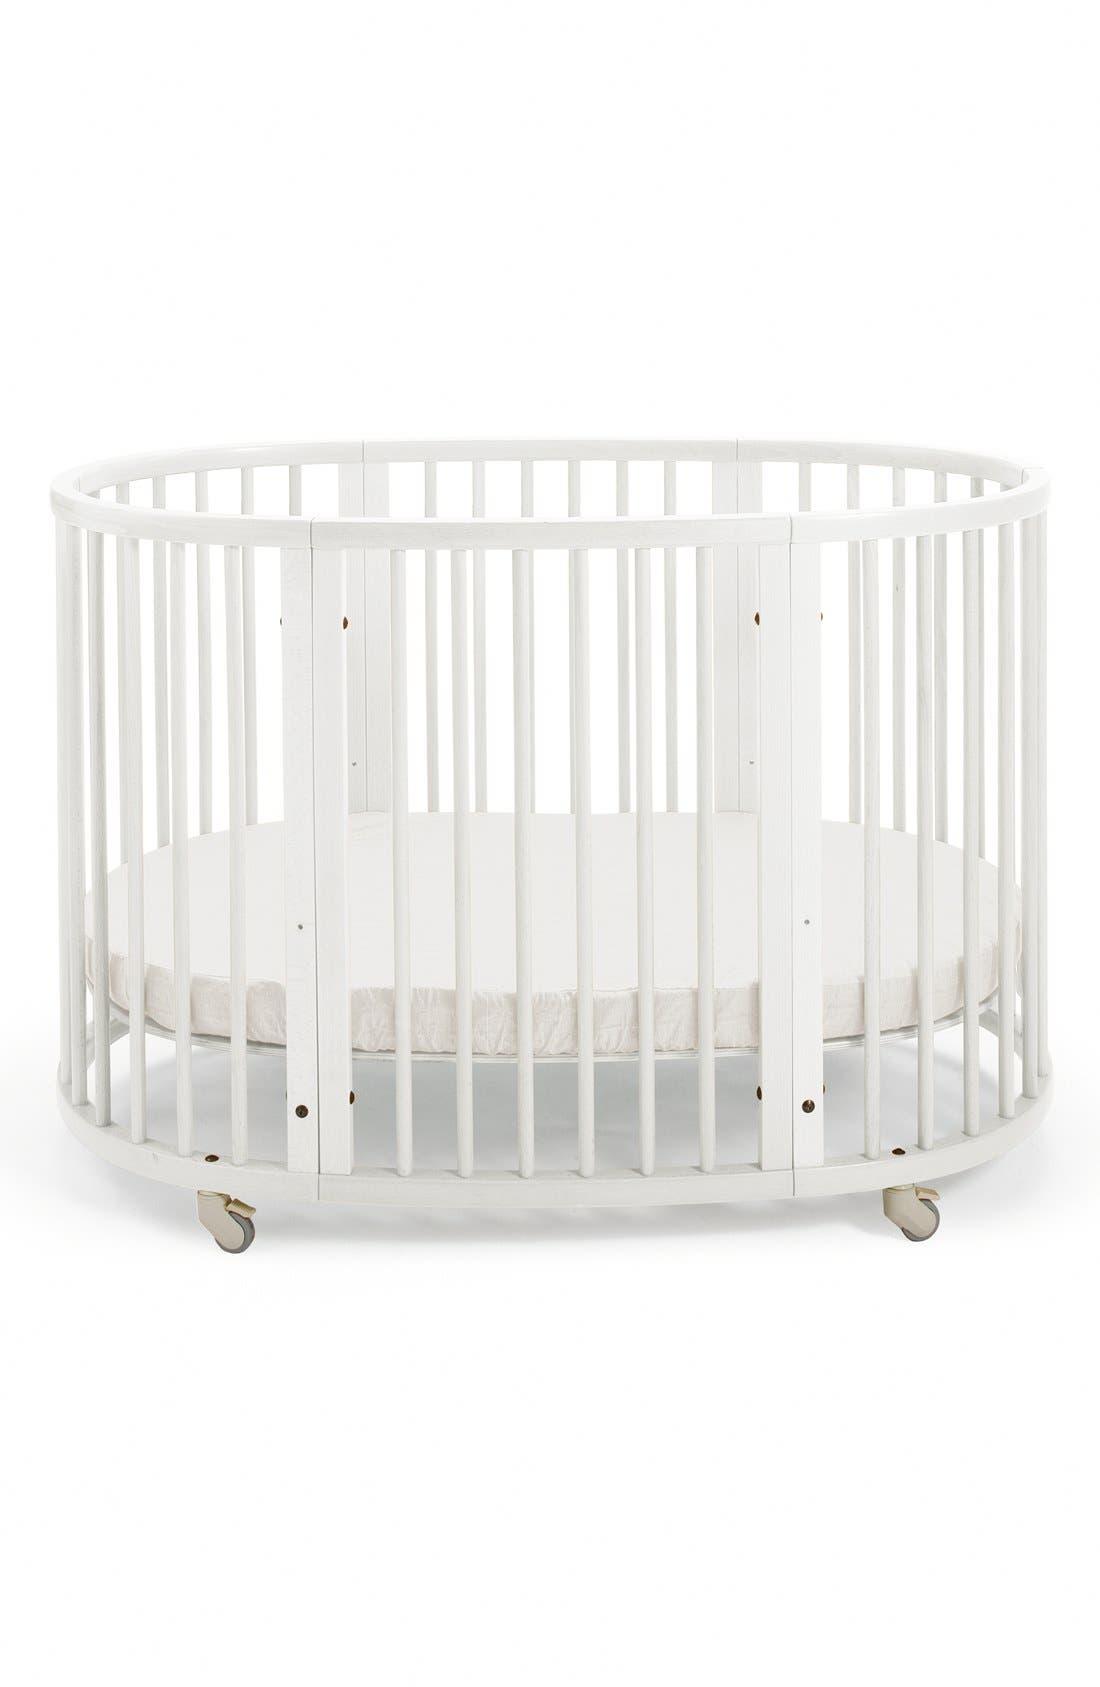 Main Image - Stokke Convertible Sleepi Crib & Toddler Bed